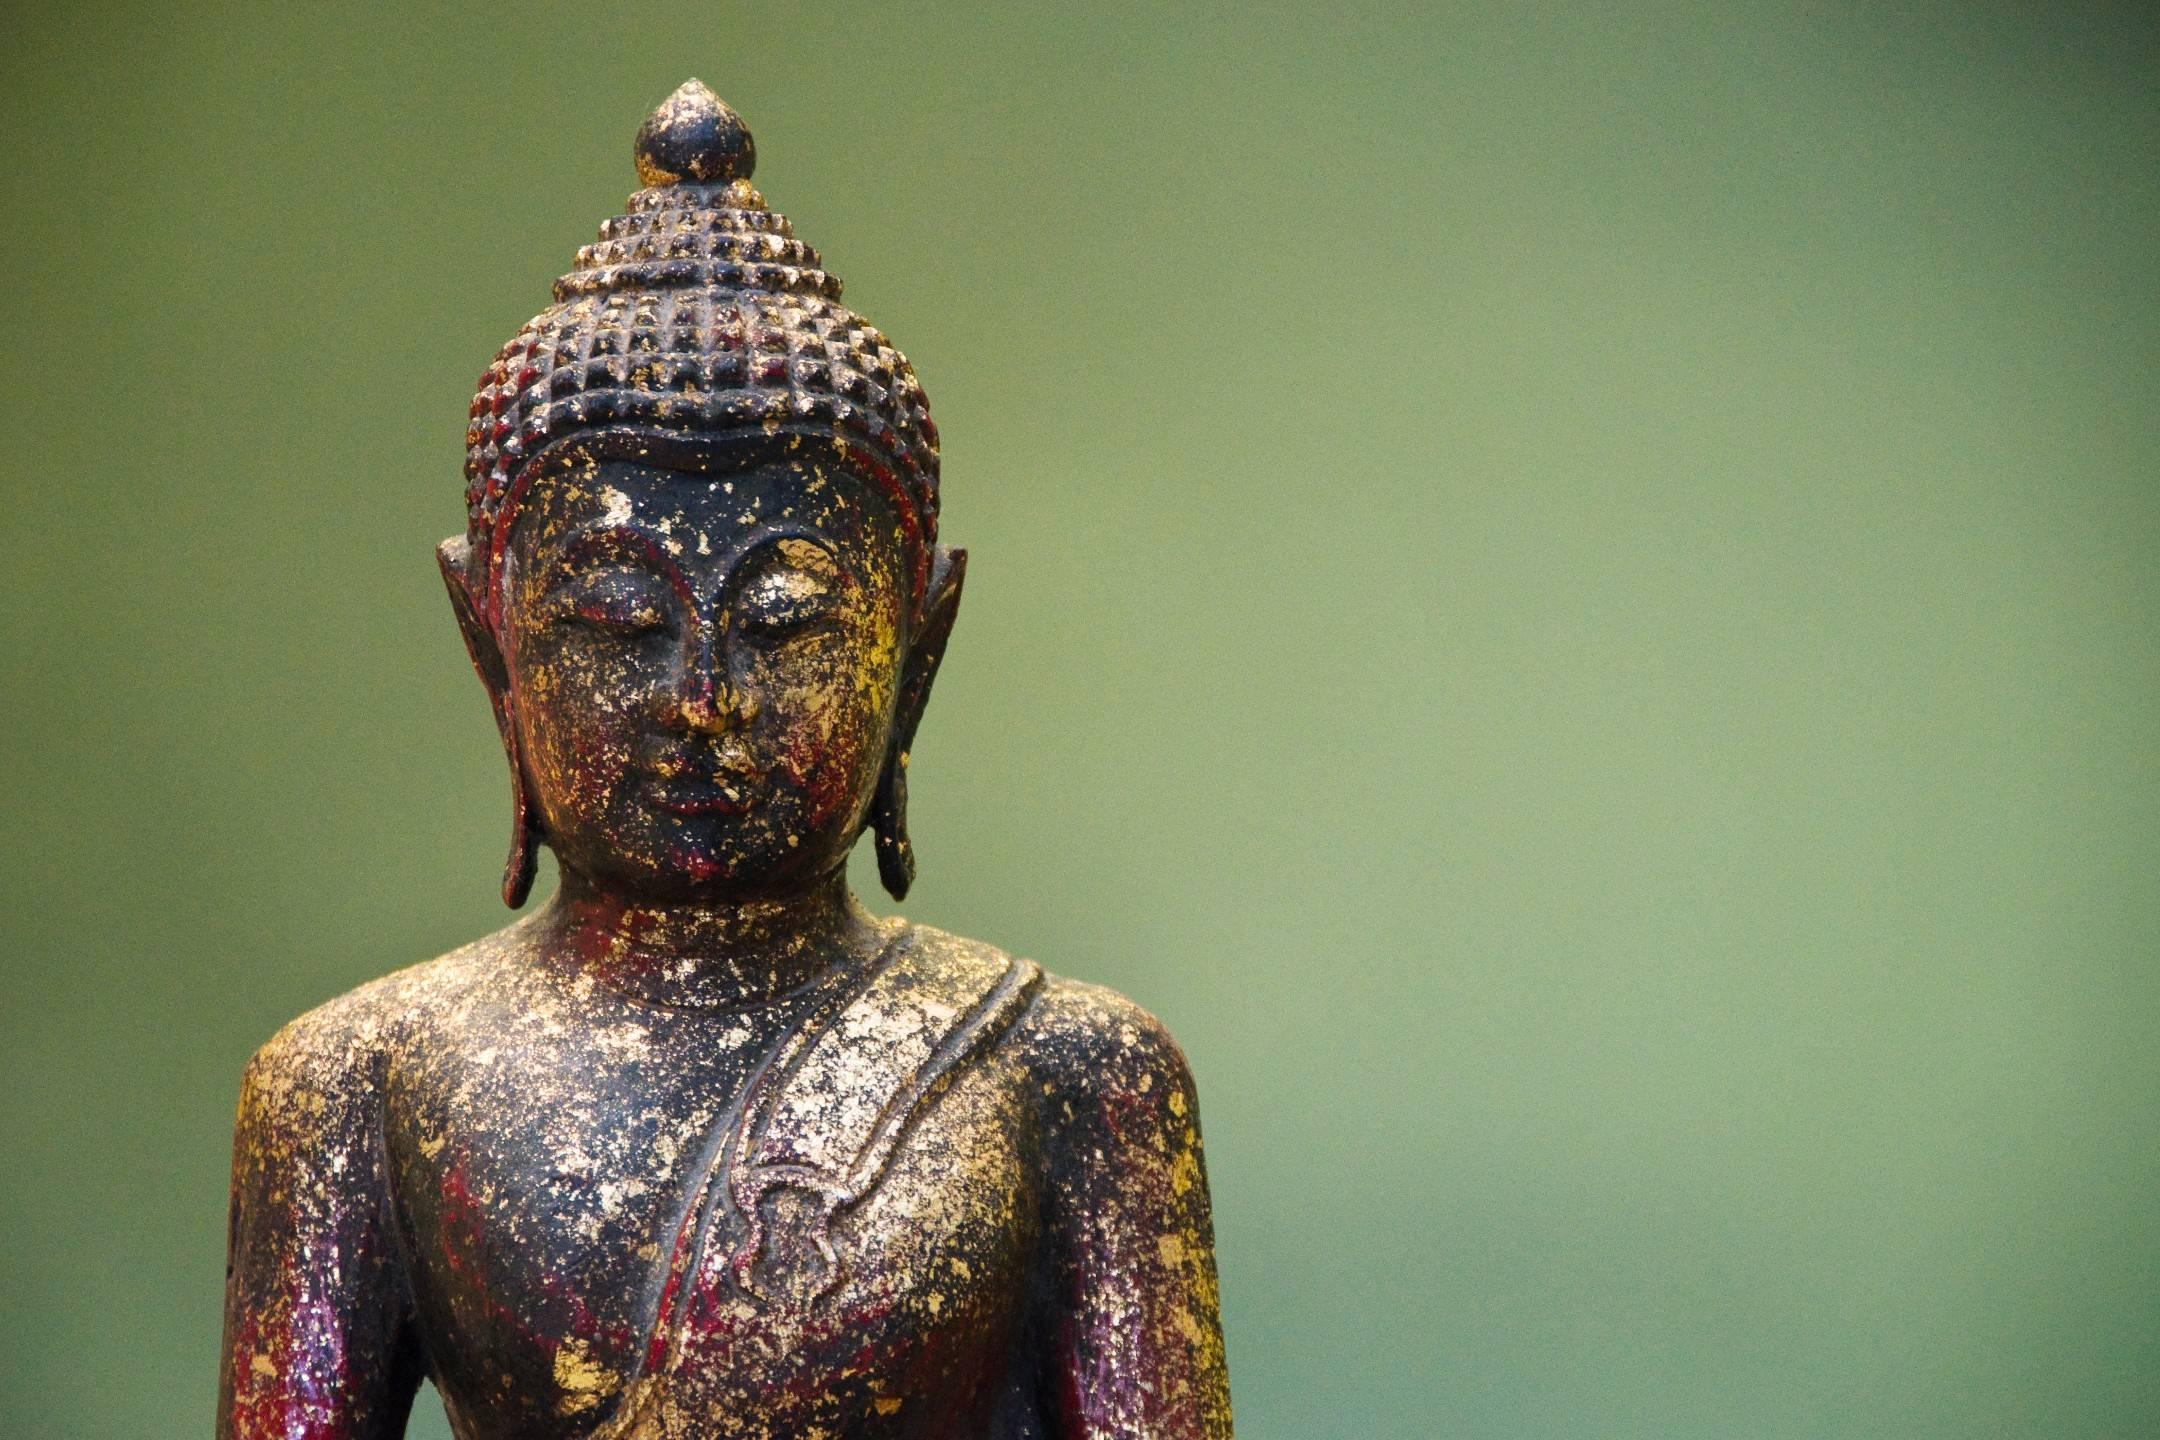 Buddha Pcela 21601440 Wallpaper 2358559 2160x1440